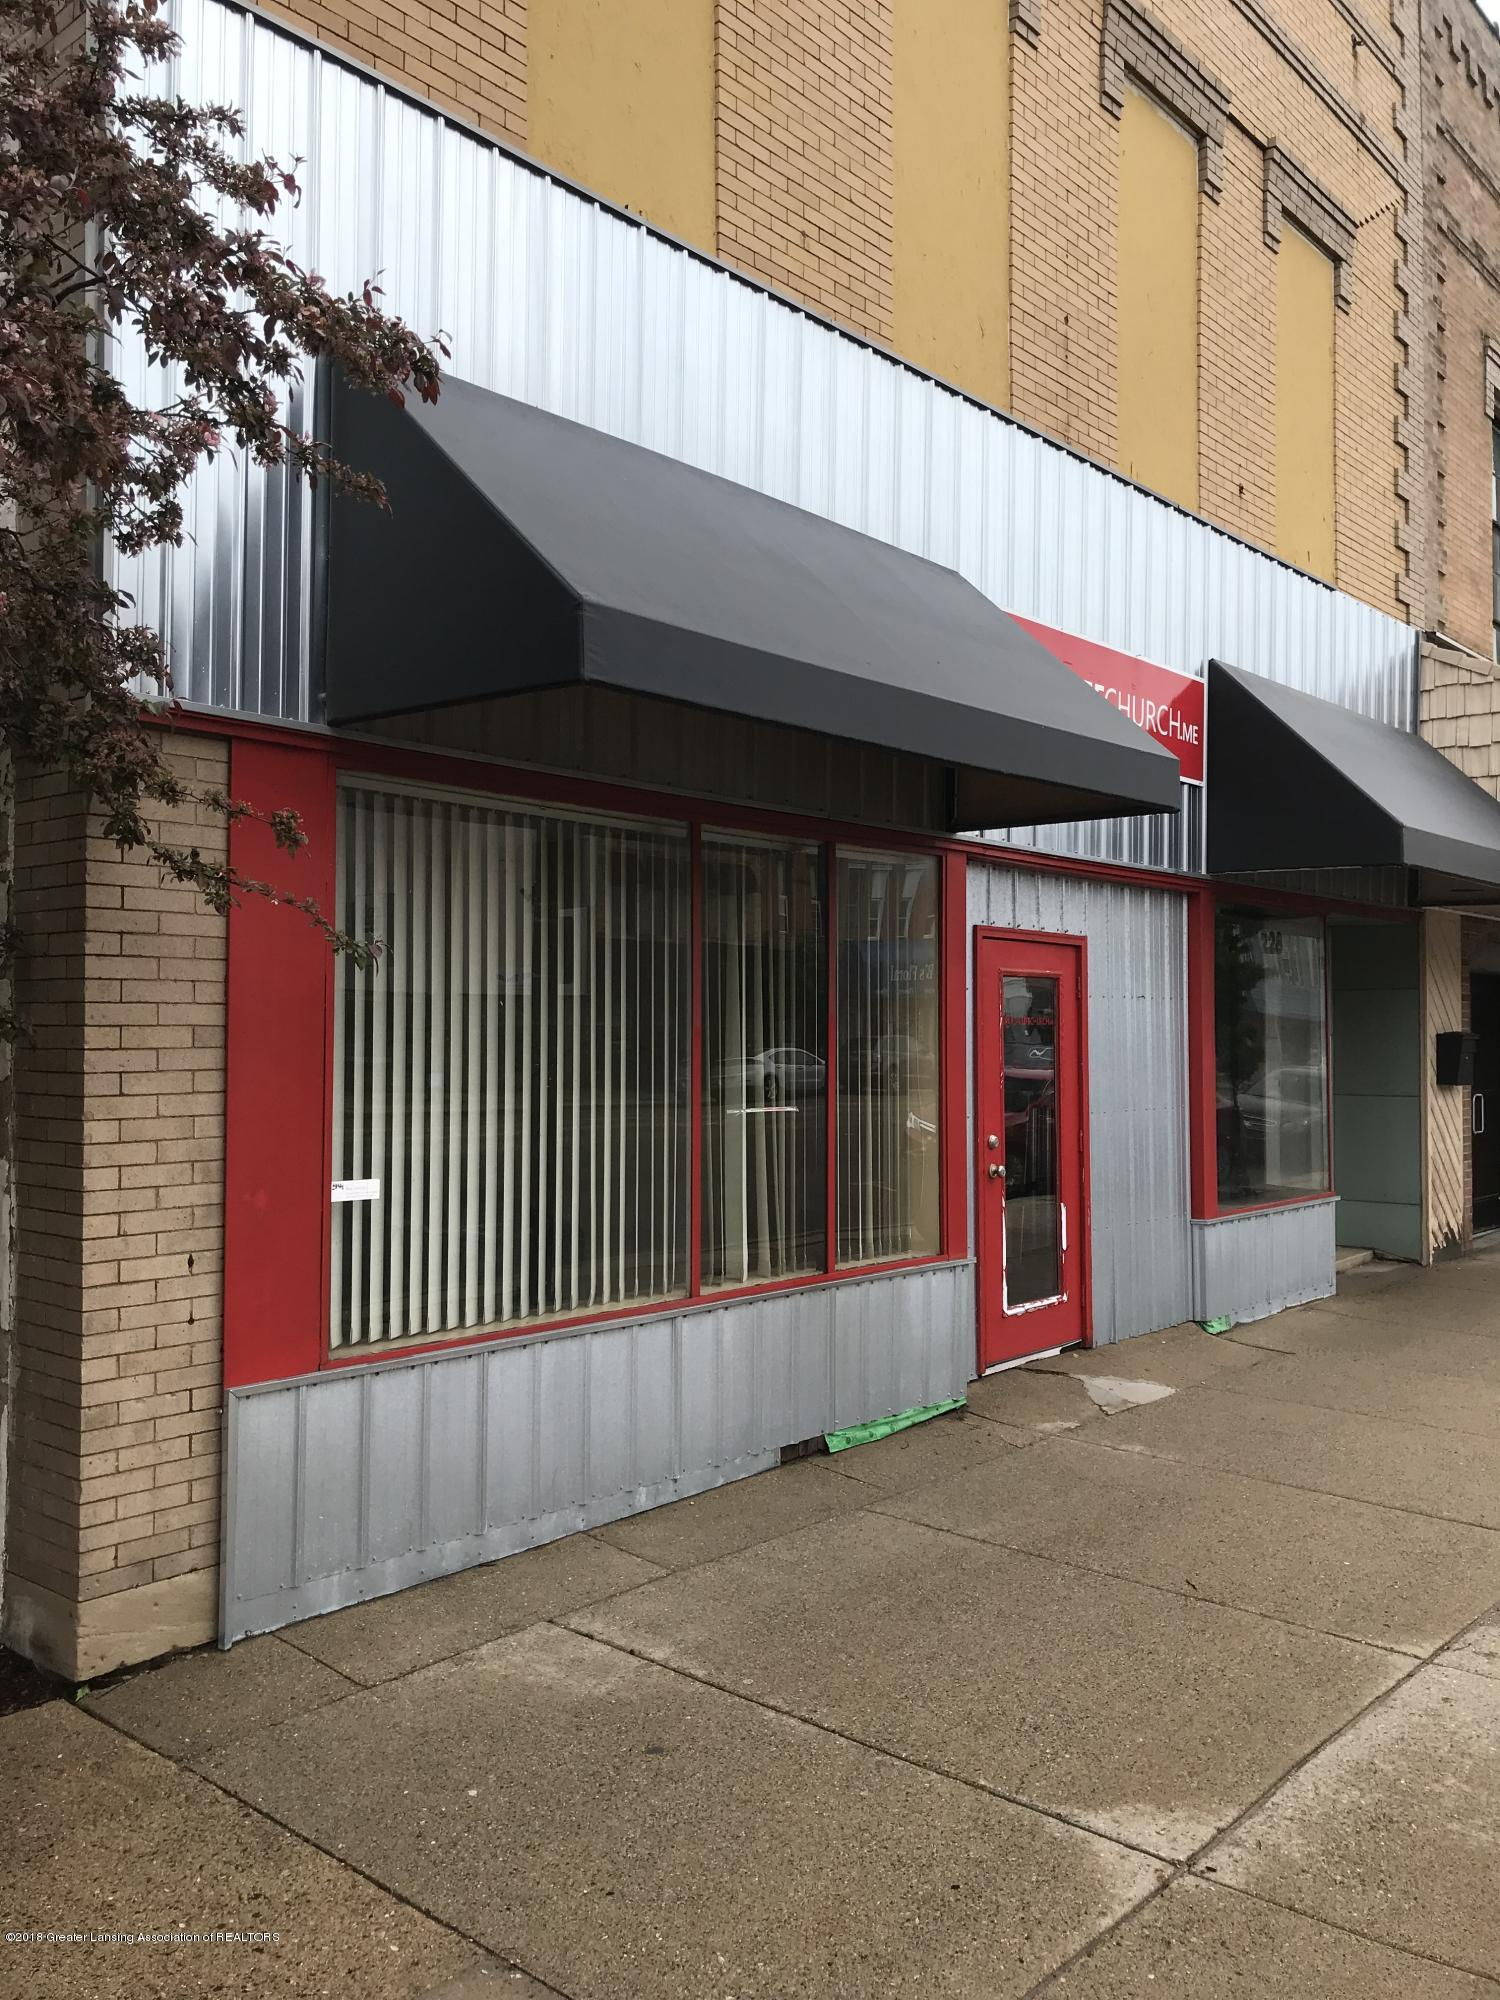 228 S Cochran Ave - 2 Street view S. - 2